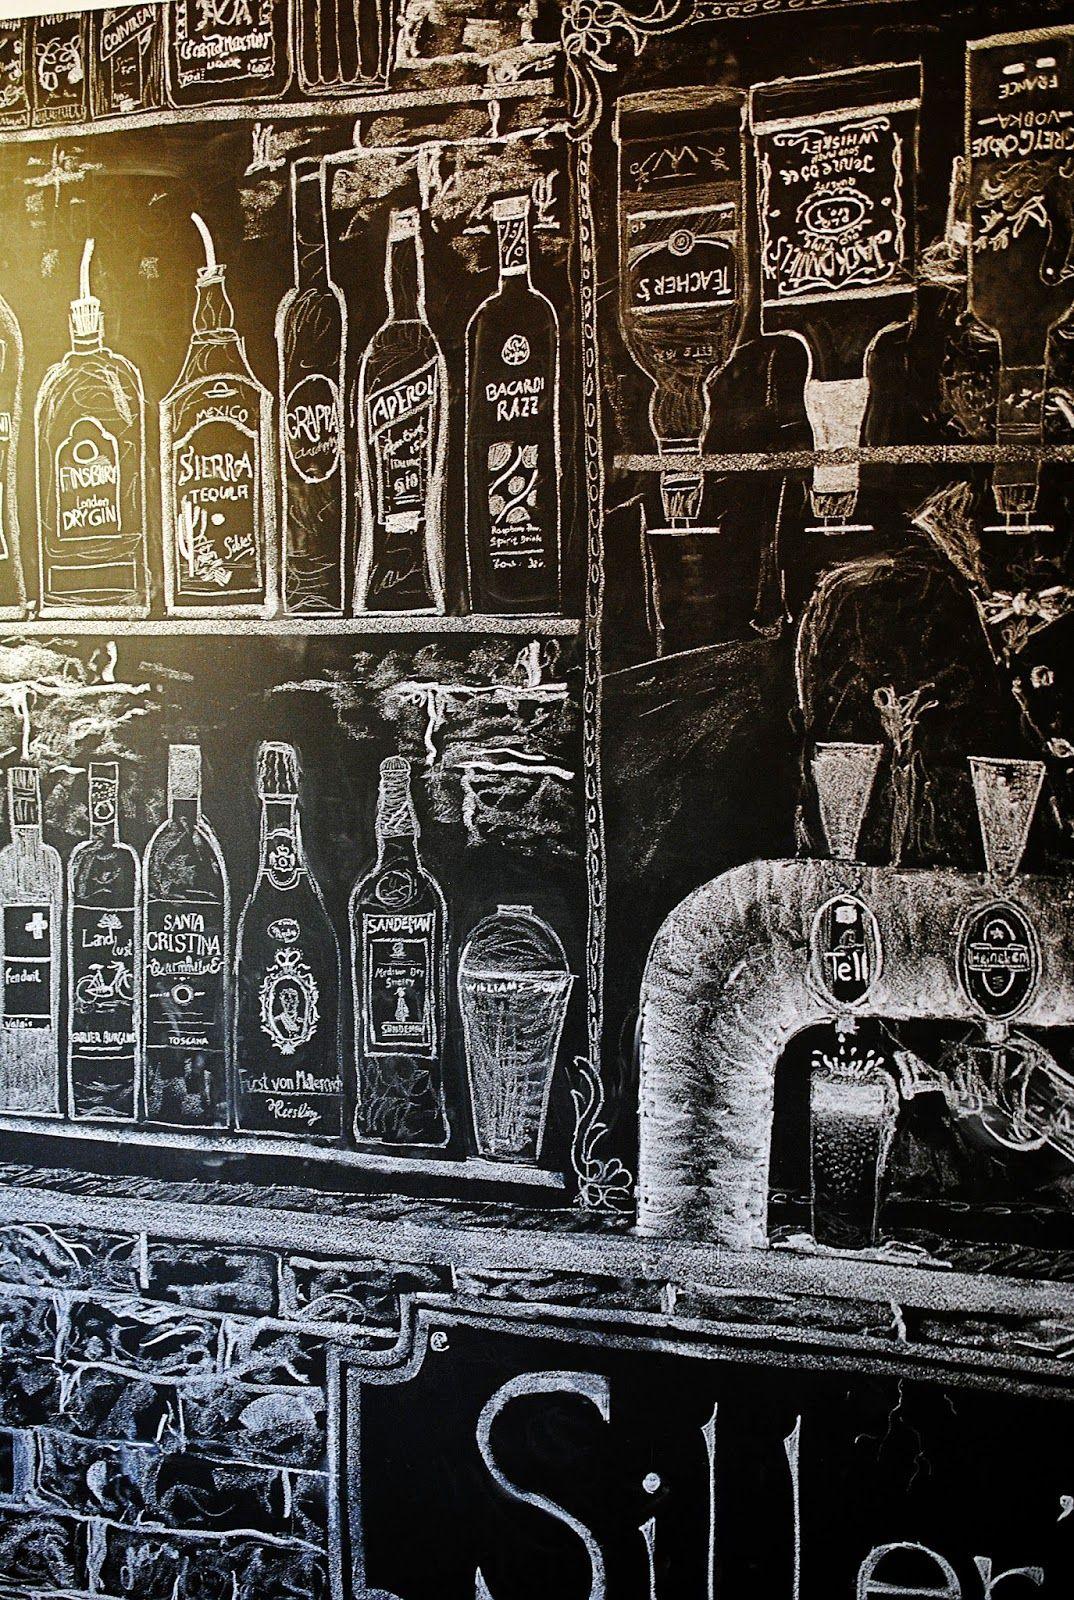 blackboard chalkboard chalk art bar enluminure. Black Bedroom Furniture Sets. Home Design Ideas